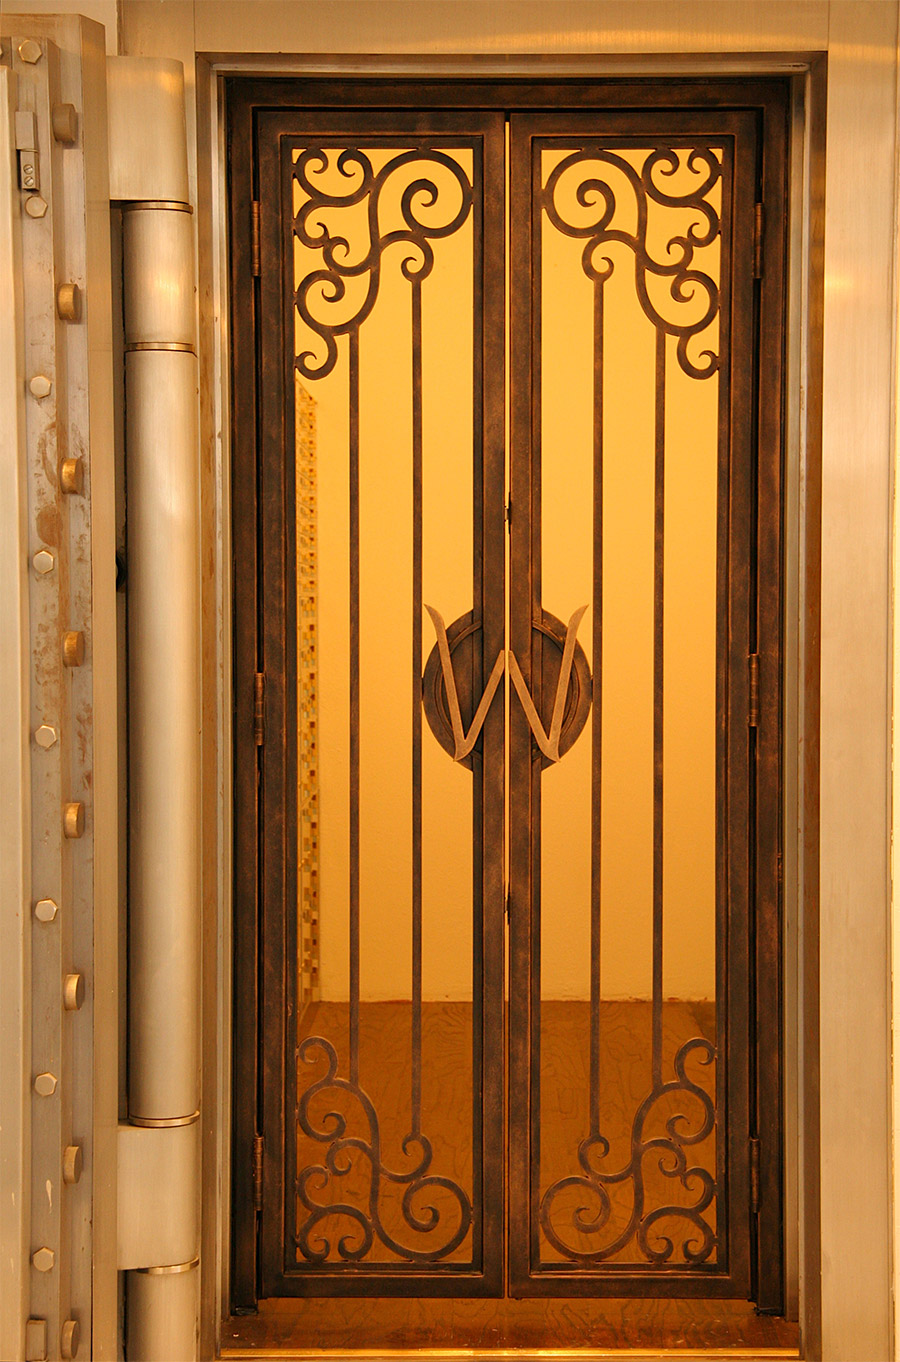 Worthington-CLA-S2-073-Classic-Steel-Doors-(18)-como-objeto-inteligente-1